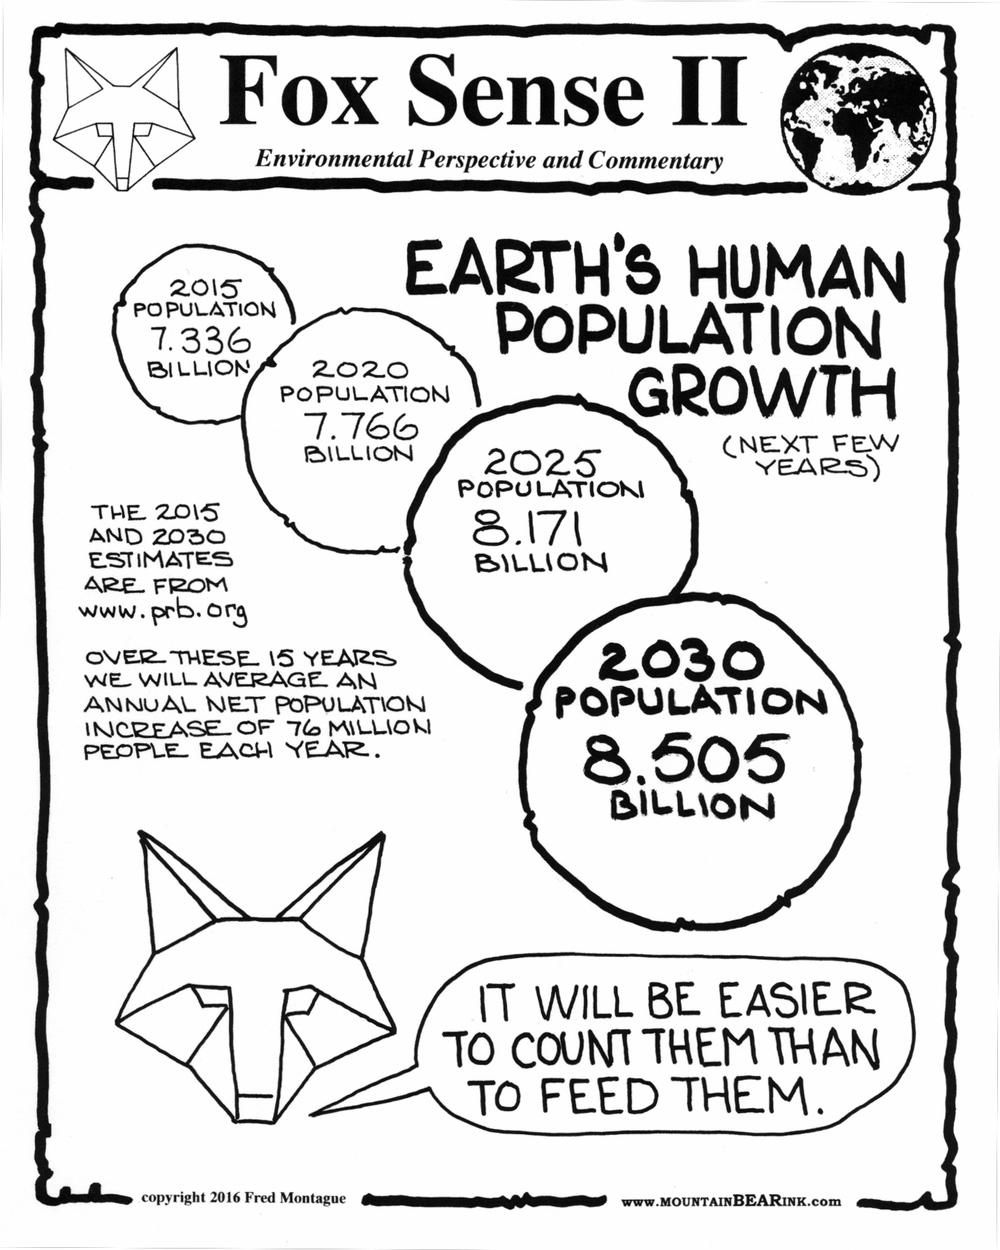 foxsense2_population2030